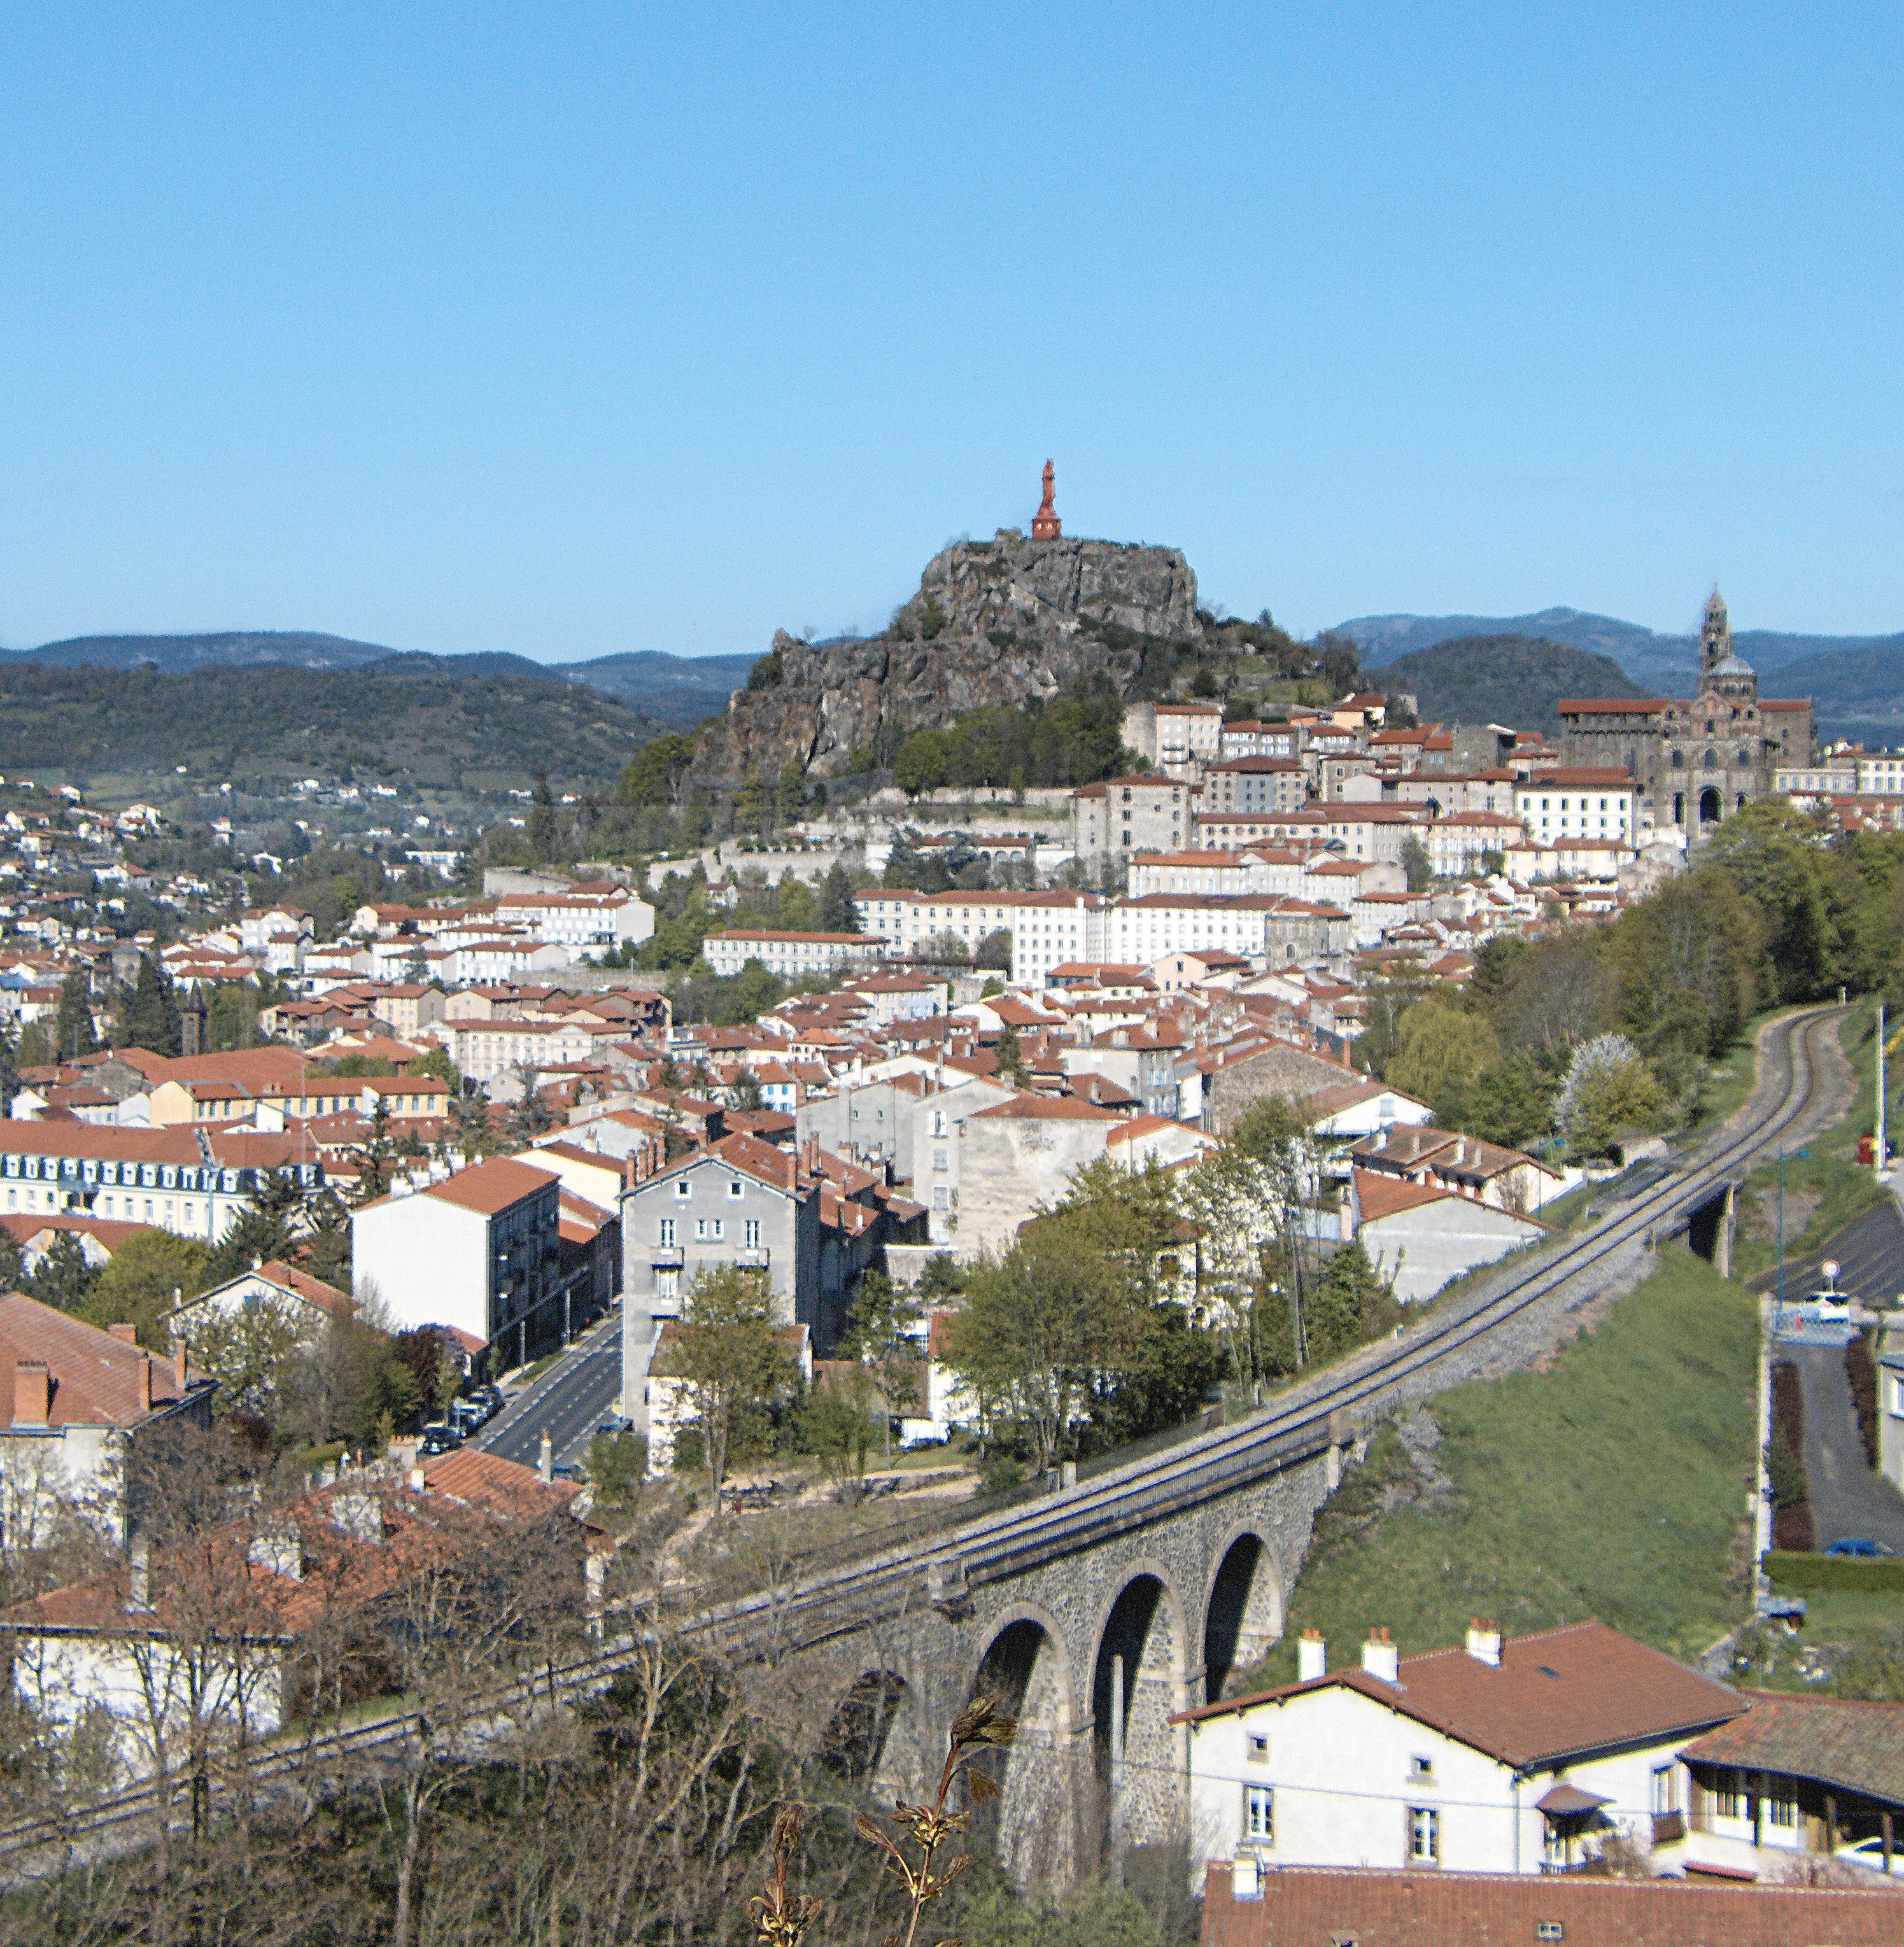 Architecte Le Puy En Velay gambar : pemandangan, kaki langit, sungai, pemandangan kota